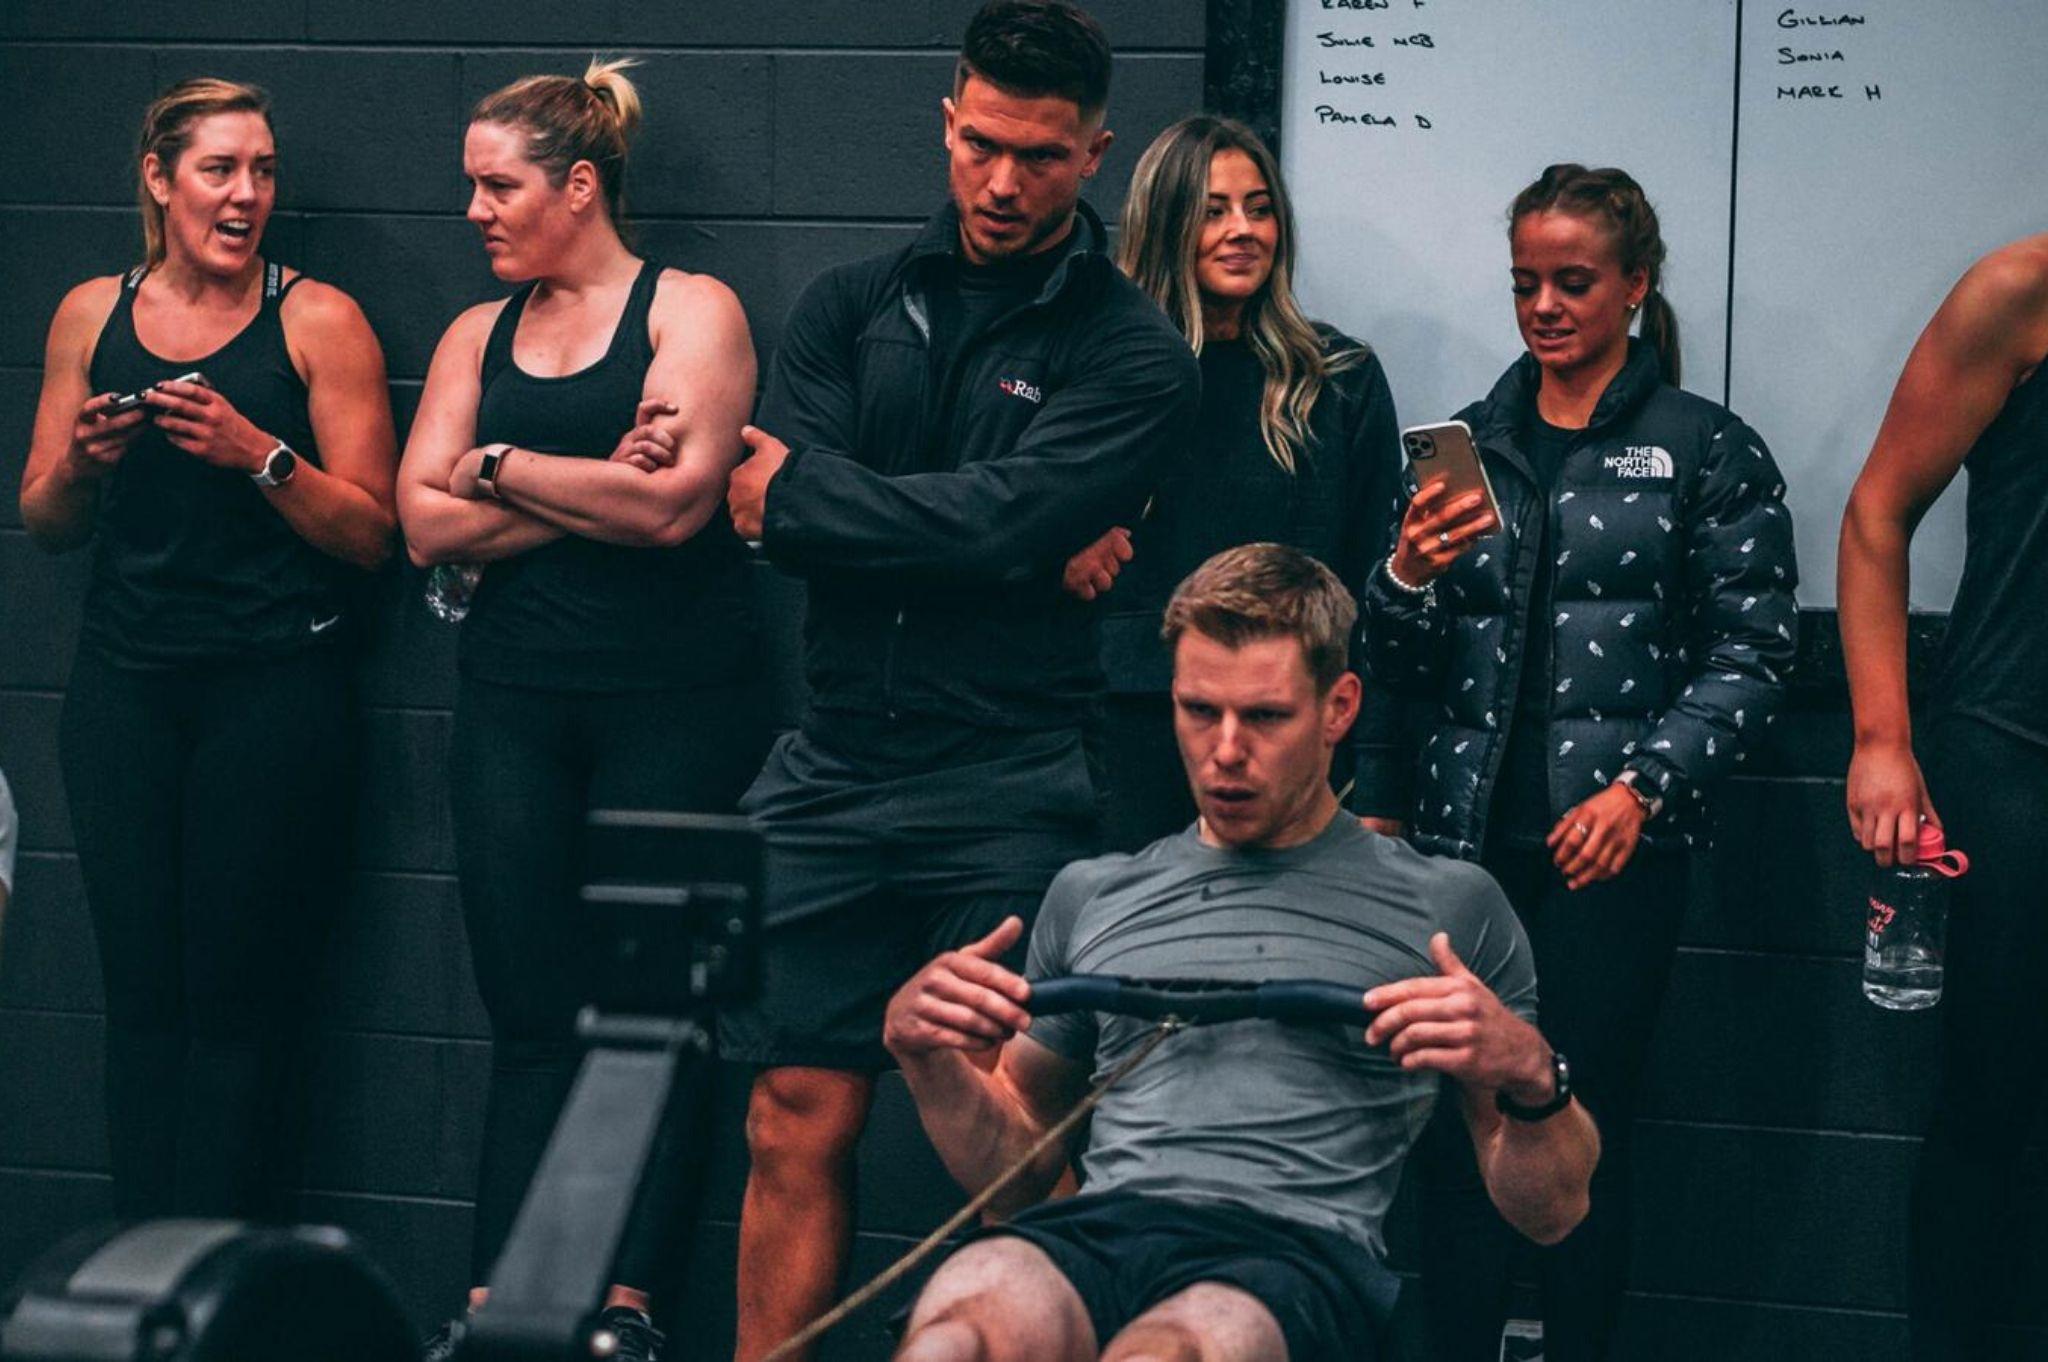 gladiator training & owner scott mcgarry